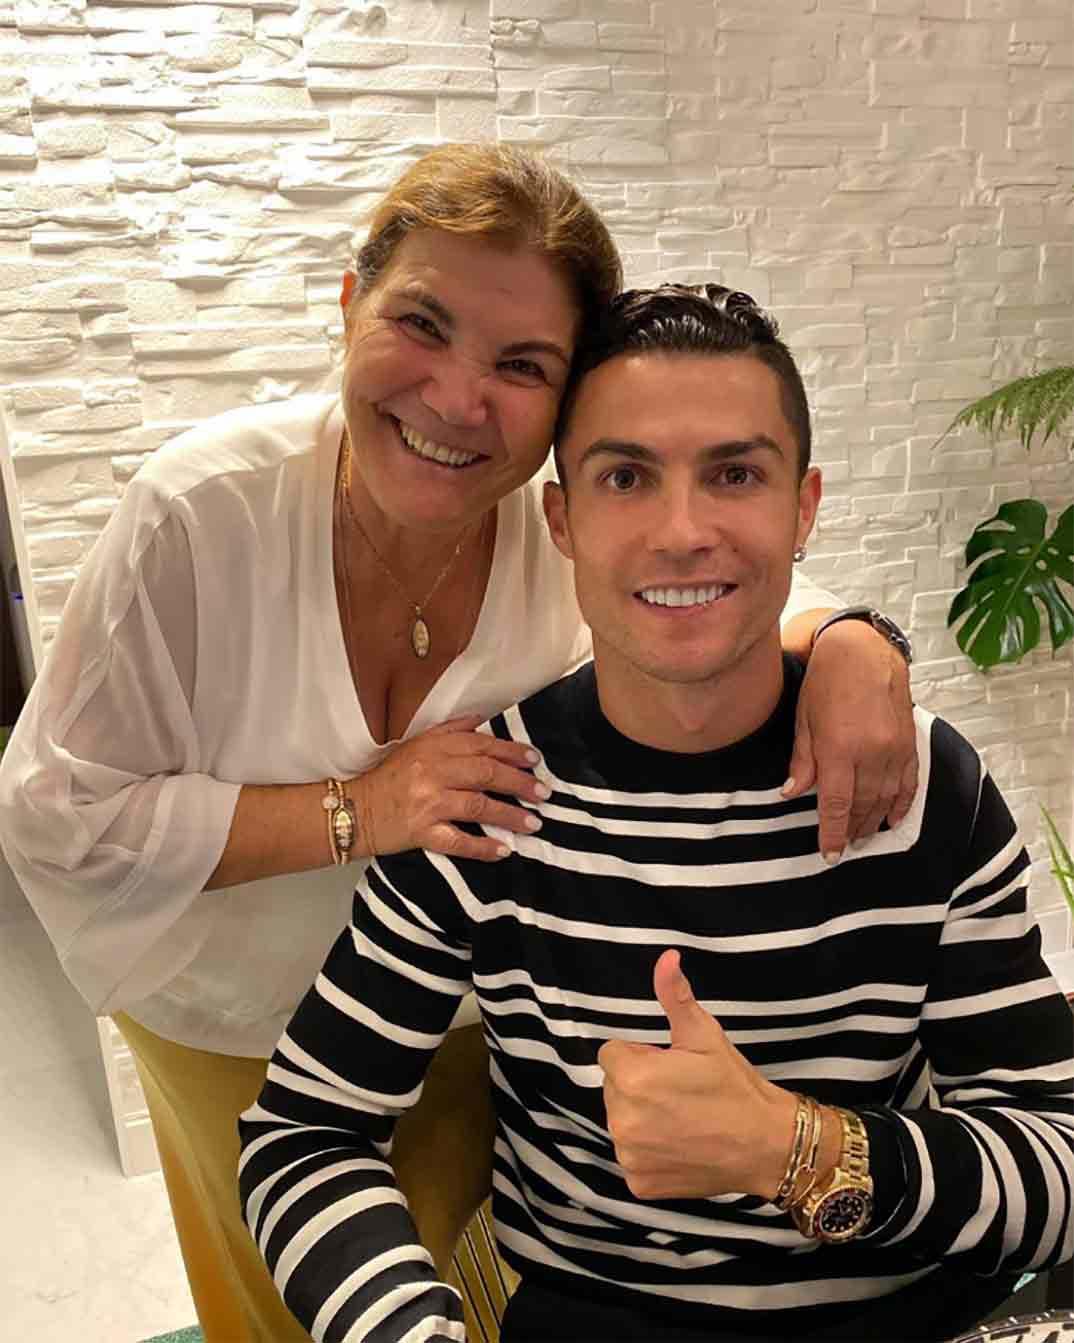 Cristiano Ronaldo muy criticado por regalarle un coche a su madre de 100.000€